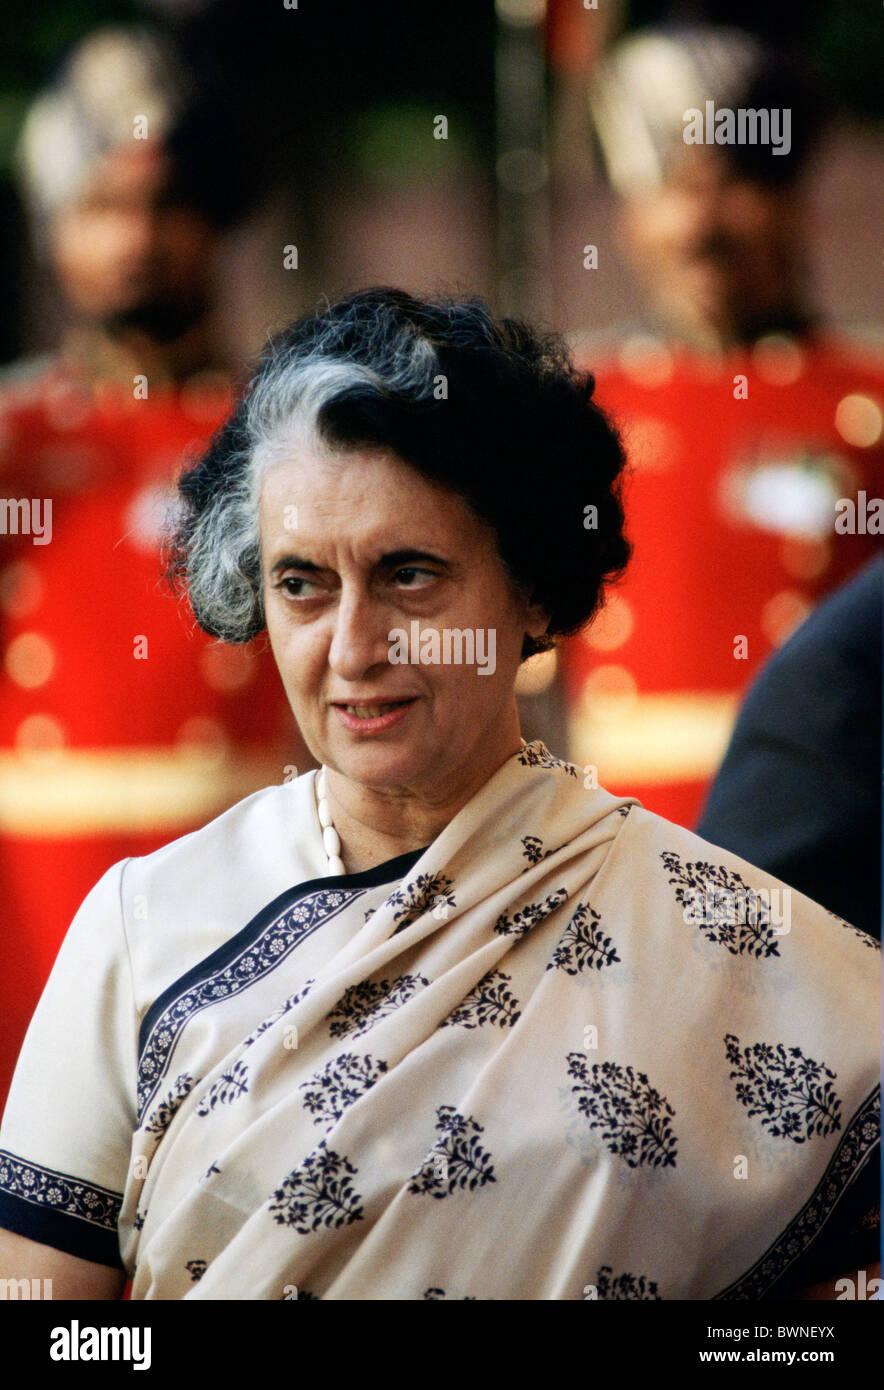 Indira Gandhi, Prime Minister of India - Stock Image